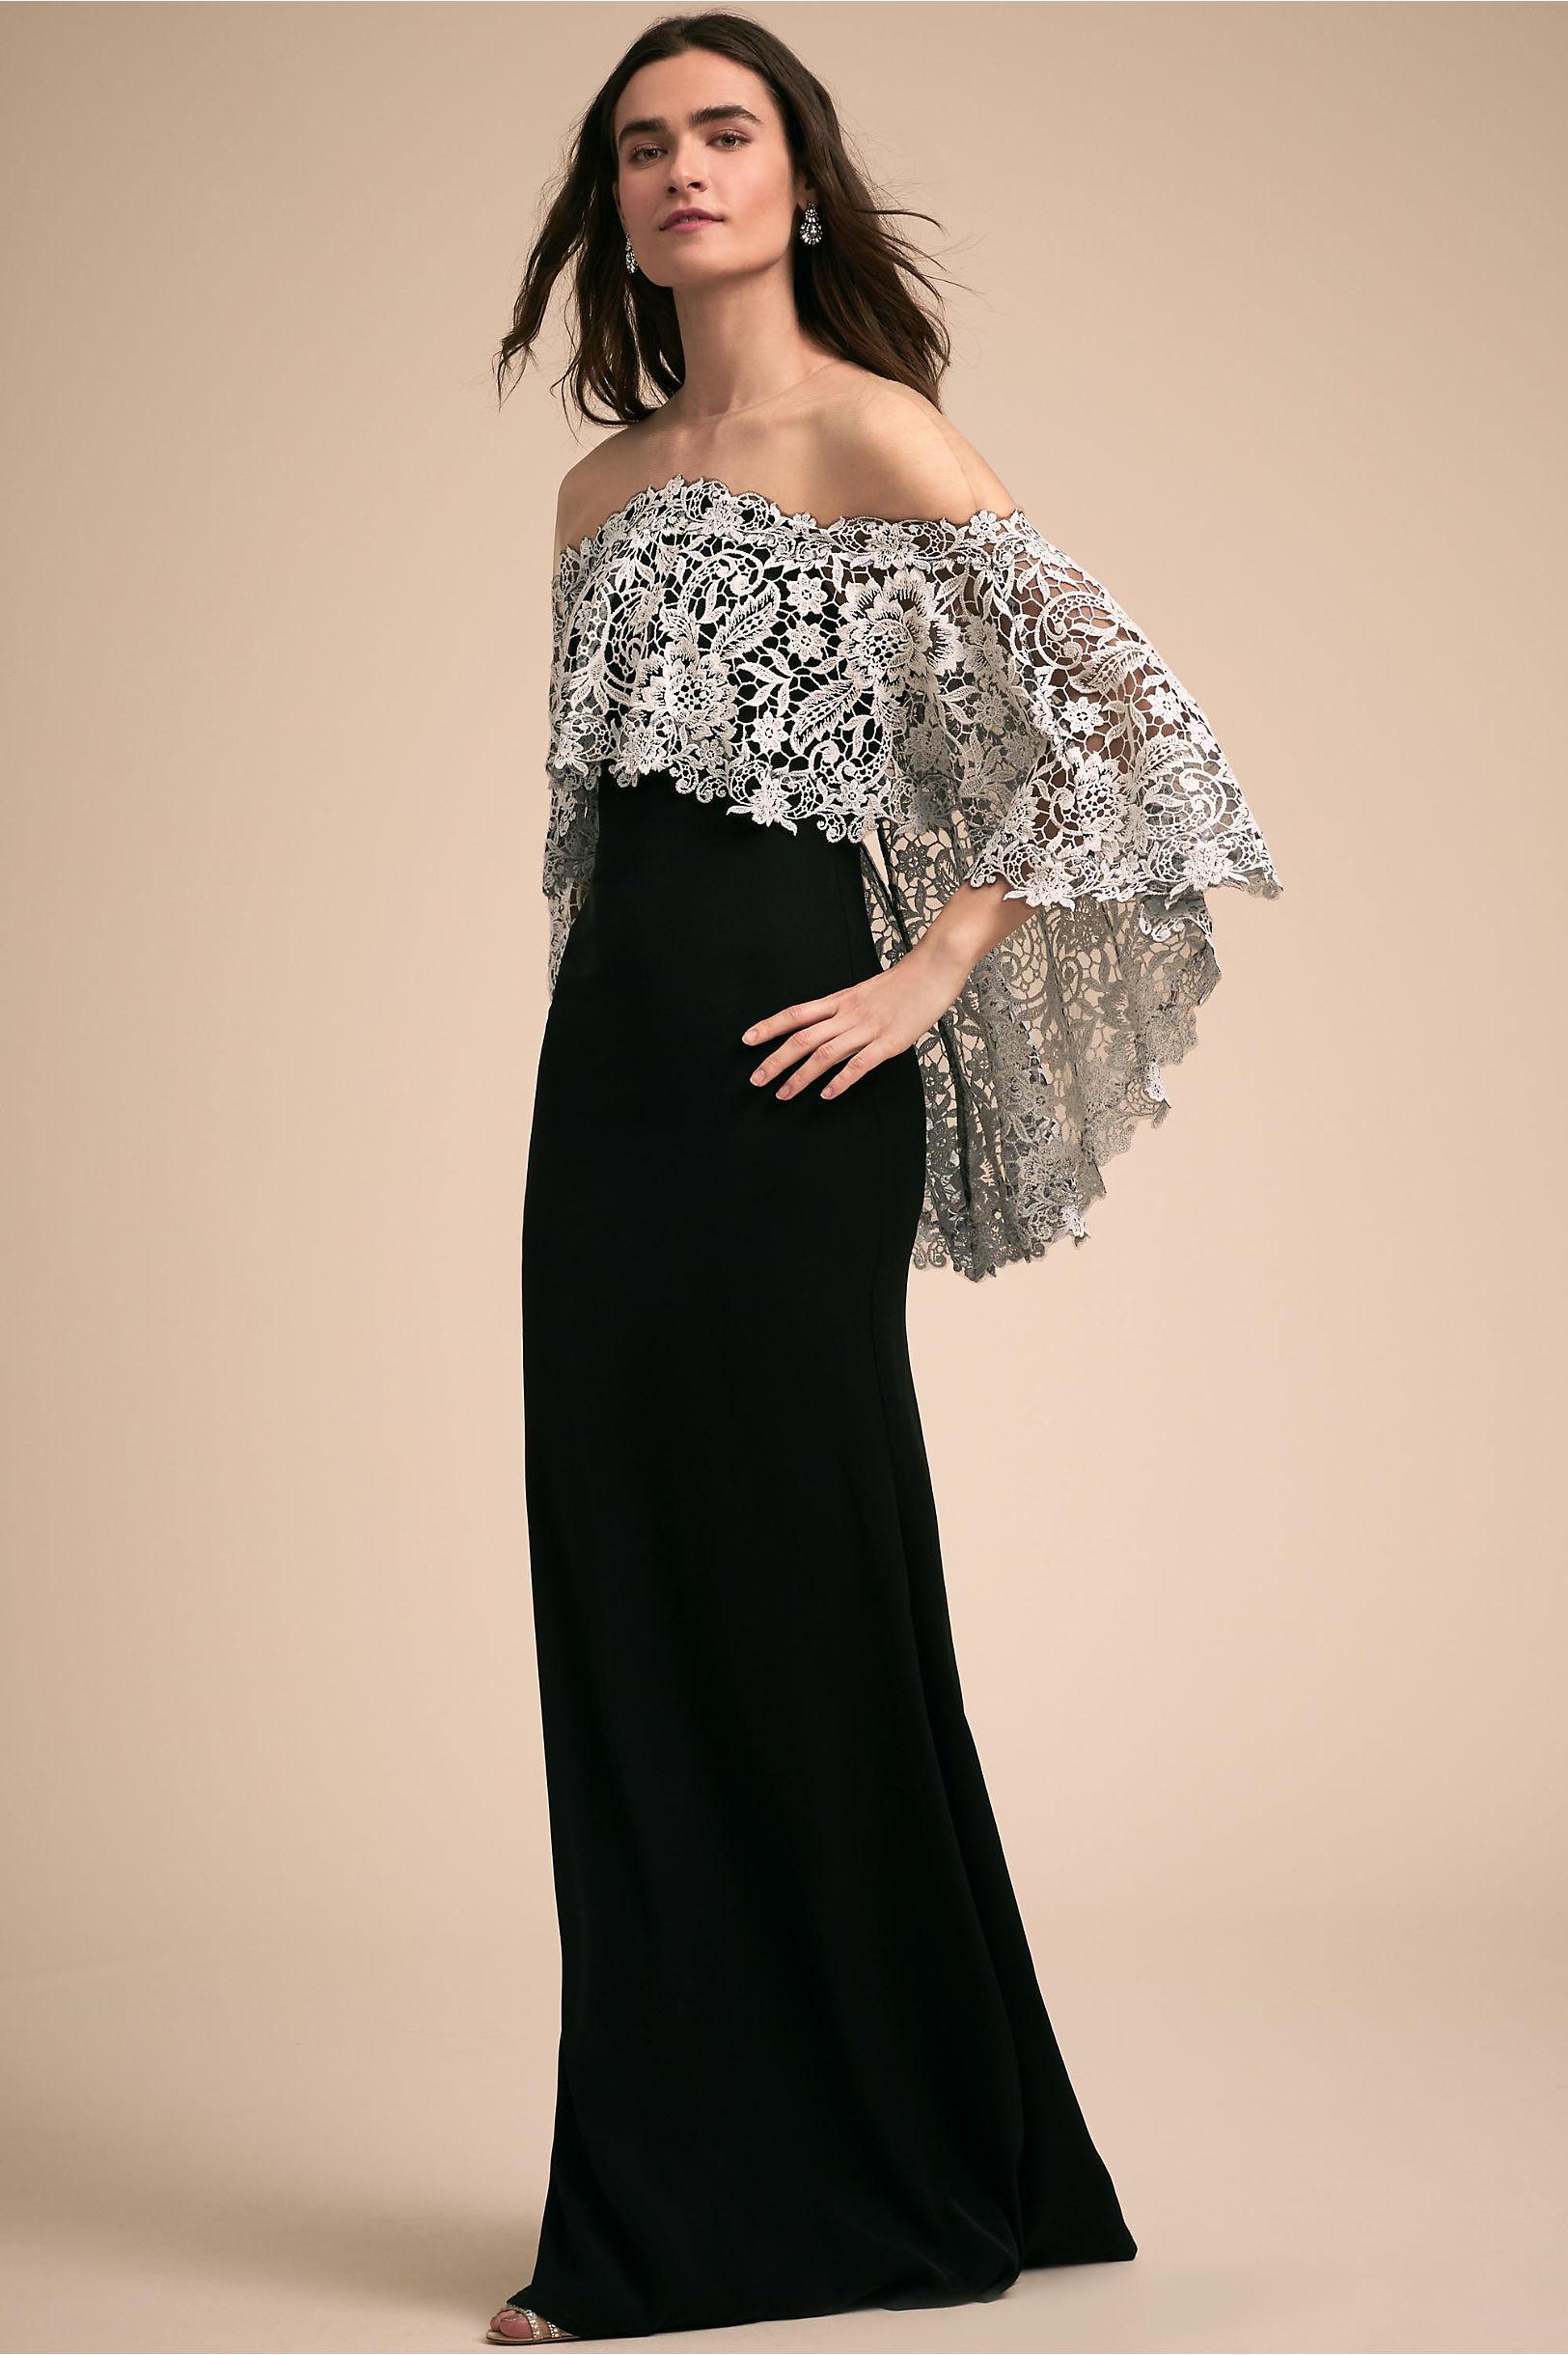 Hermosa Dress in Sale | BHLDN